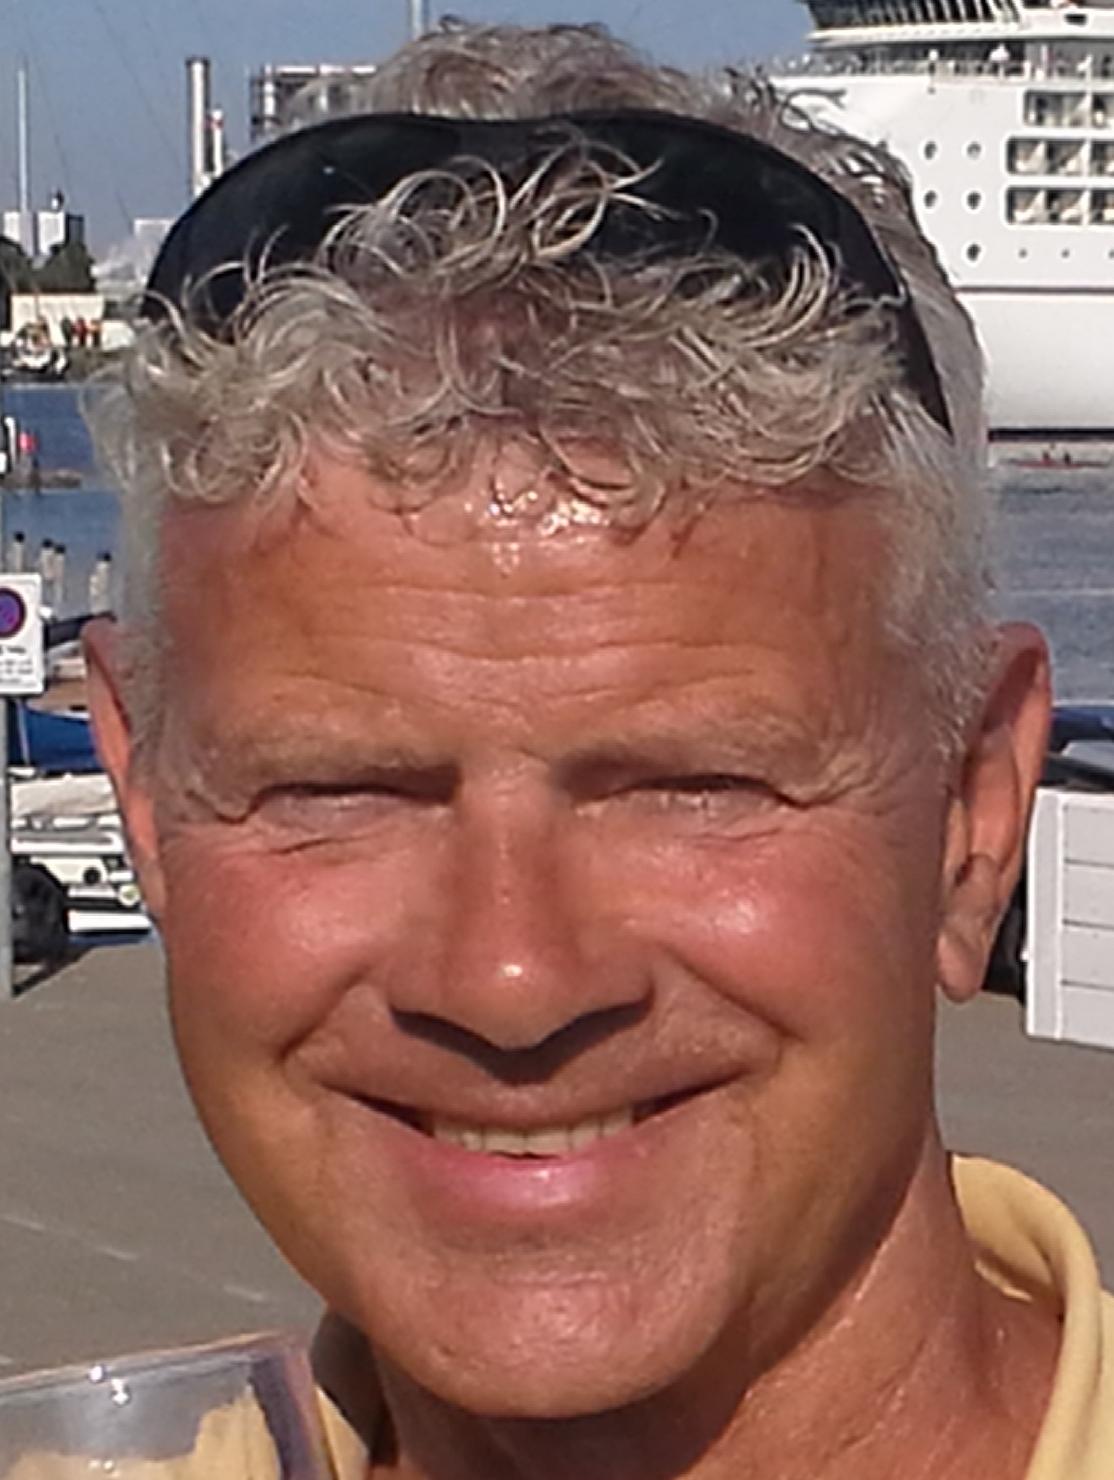 Team mare event - <b>Jan Krause</b> - jan_krause